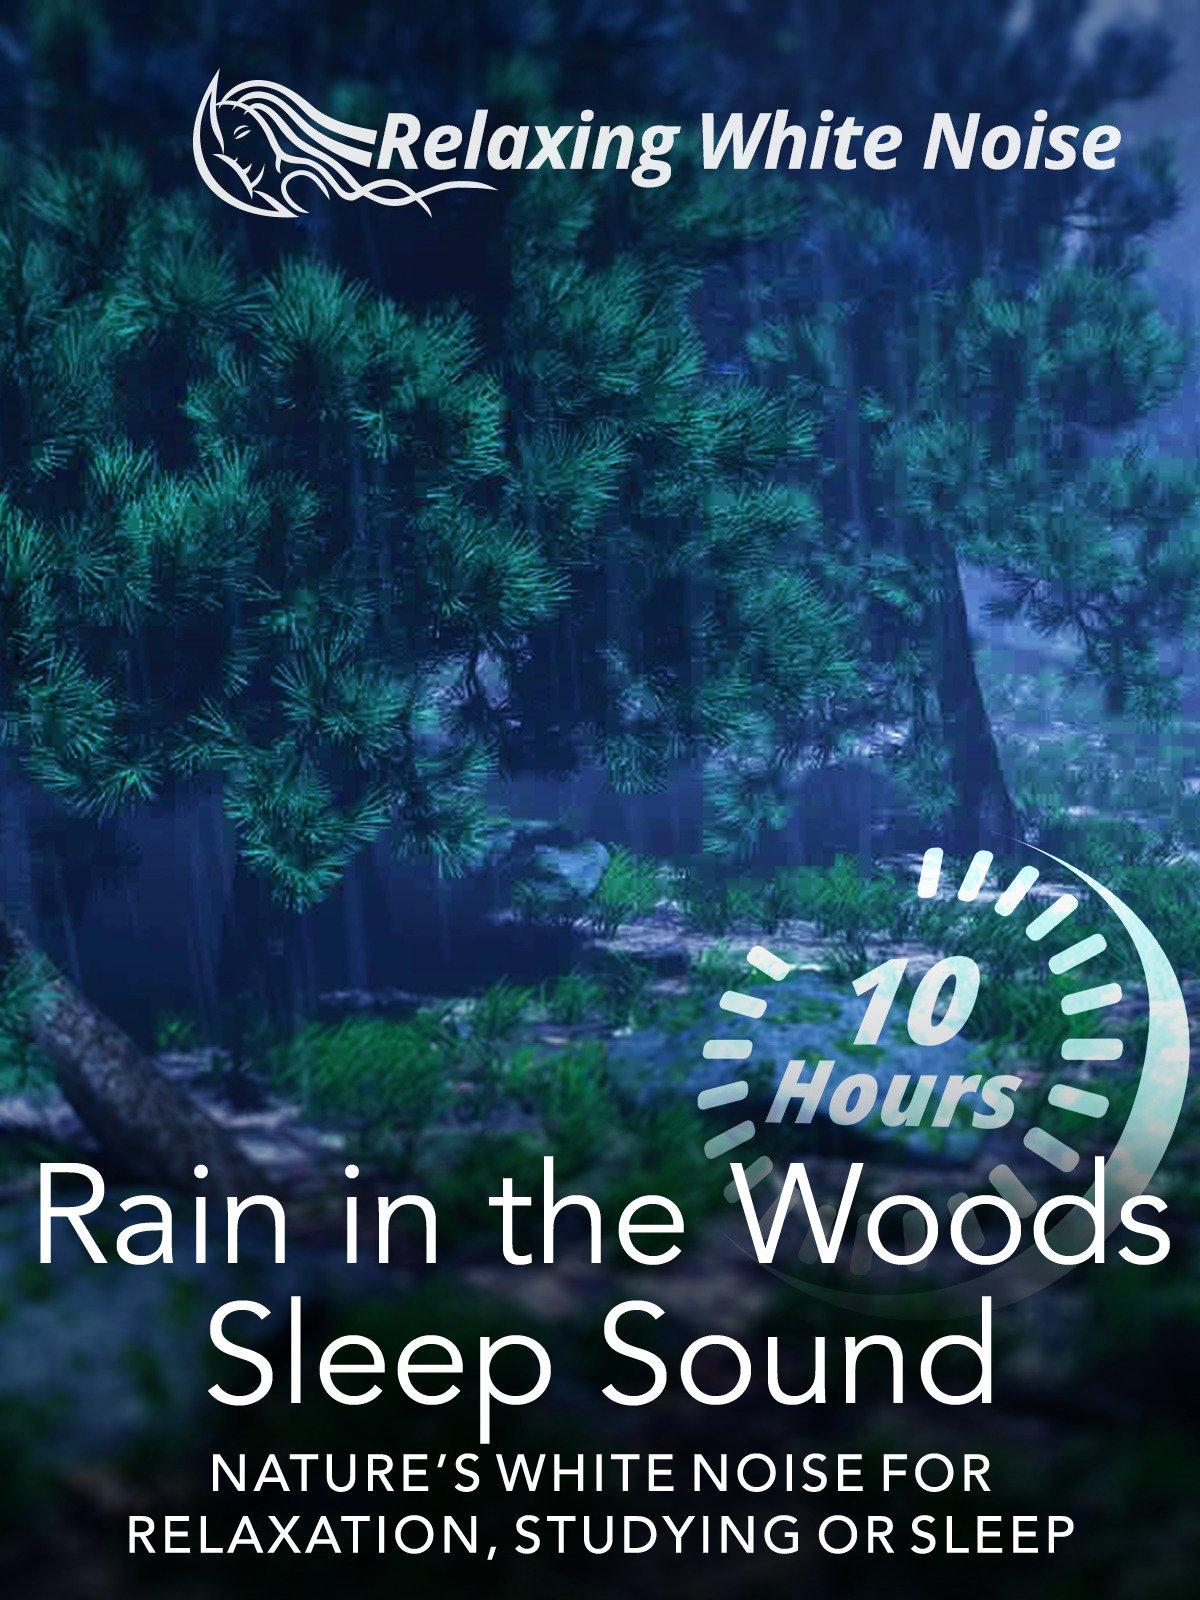 Rain in the Woods Sleep Sound 10 Hours